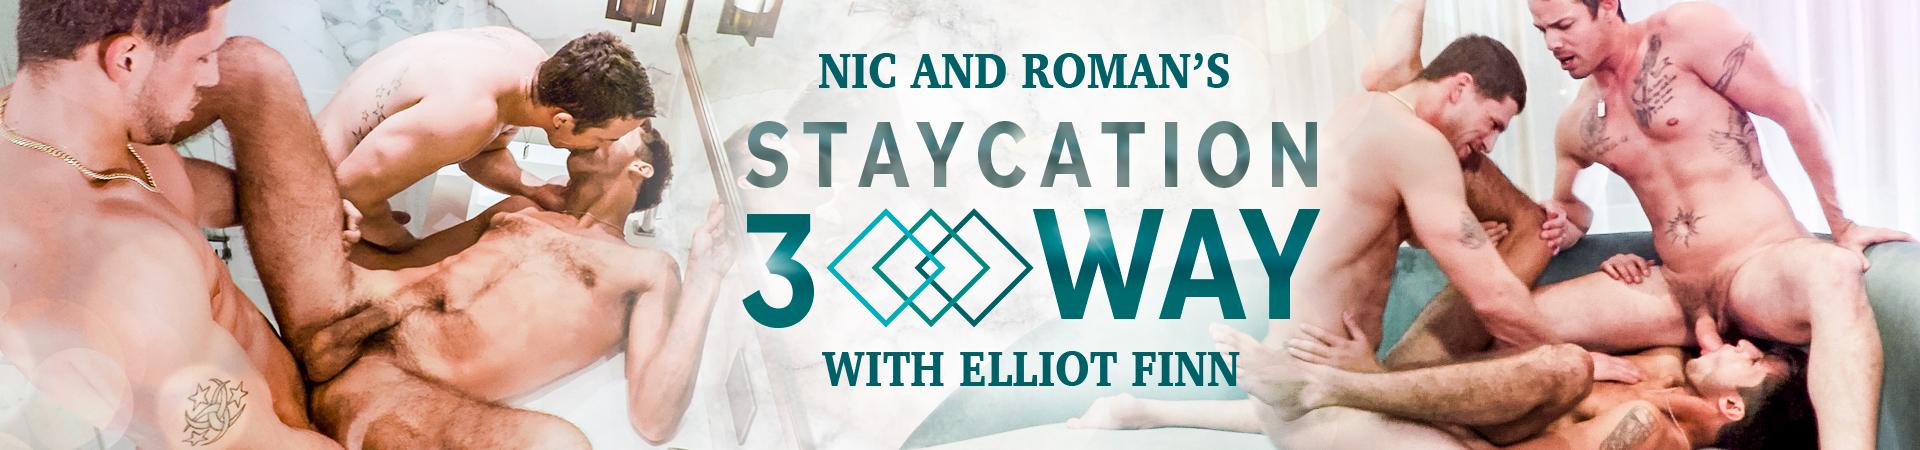 Nic & Roman's Staycation 3-Way With Elliot Finn Featuring Elliot Finn, Nic Sahara and Roman Todd